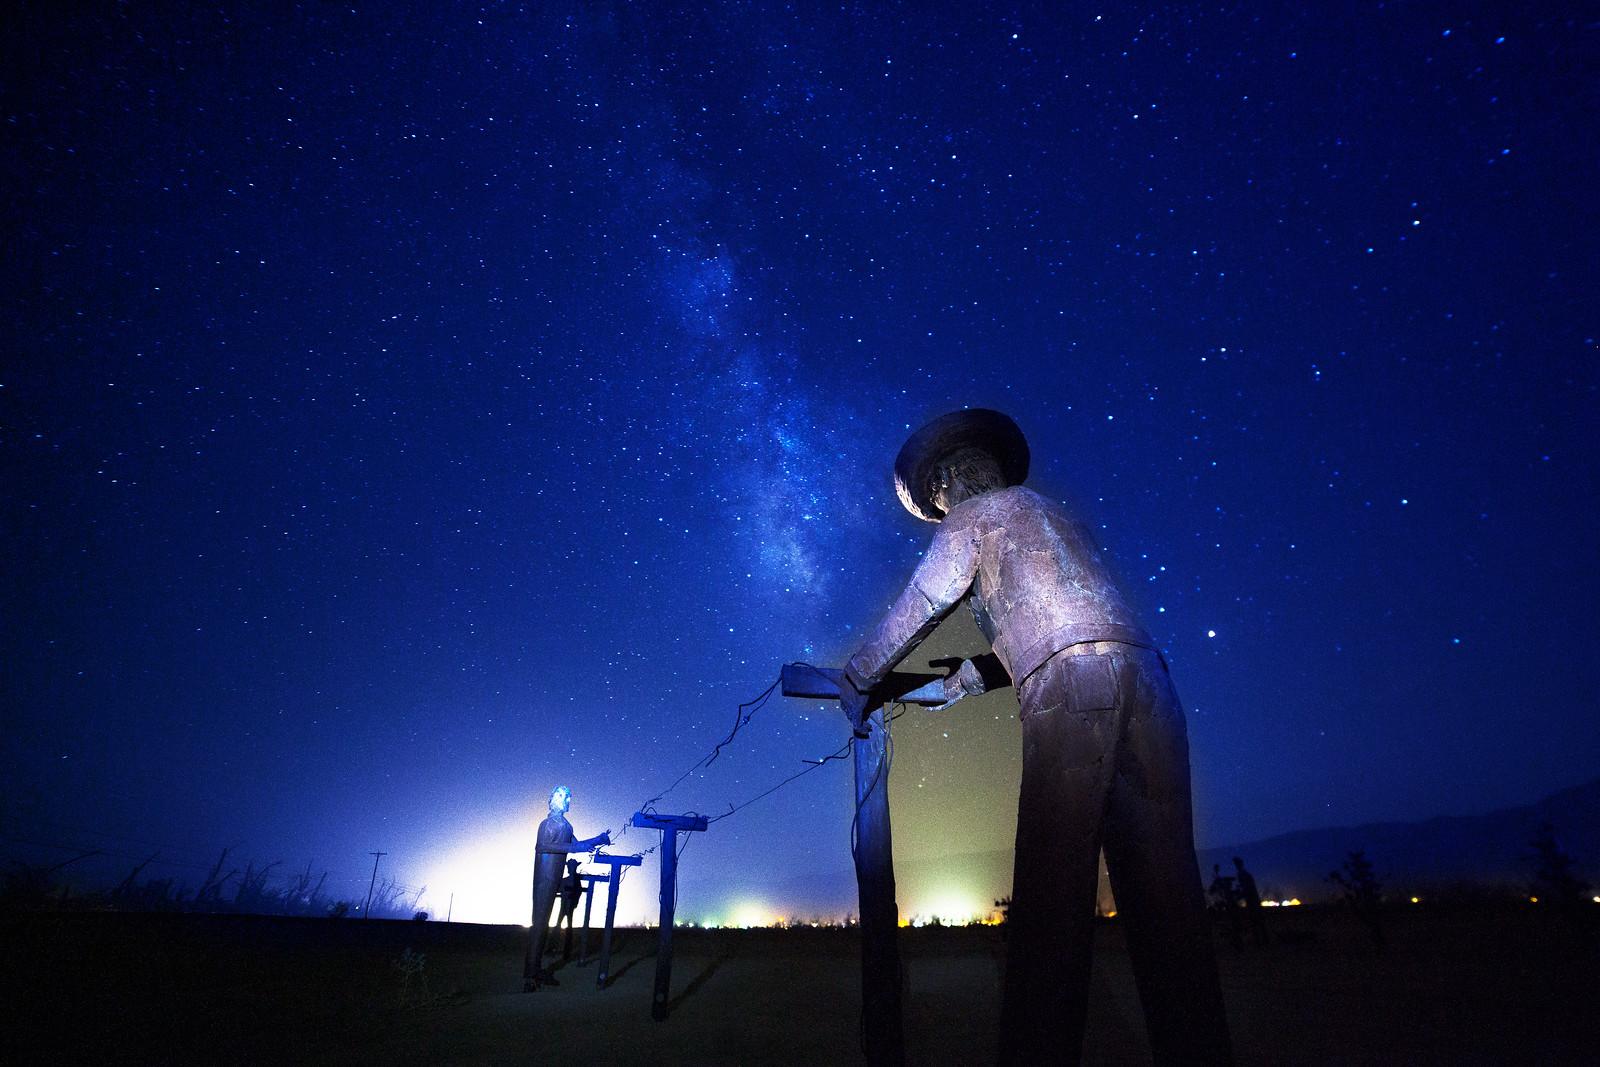 Milky Way over the  Anzo Borrego Desert